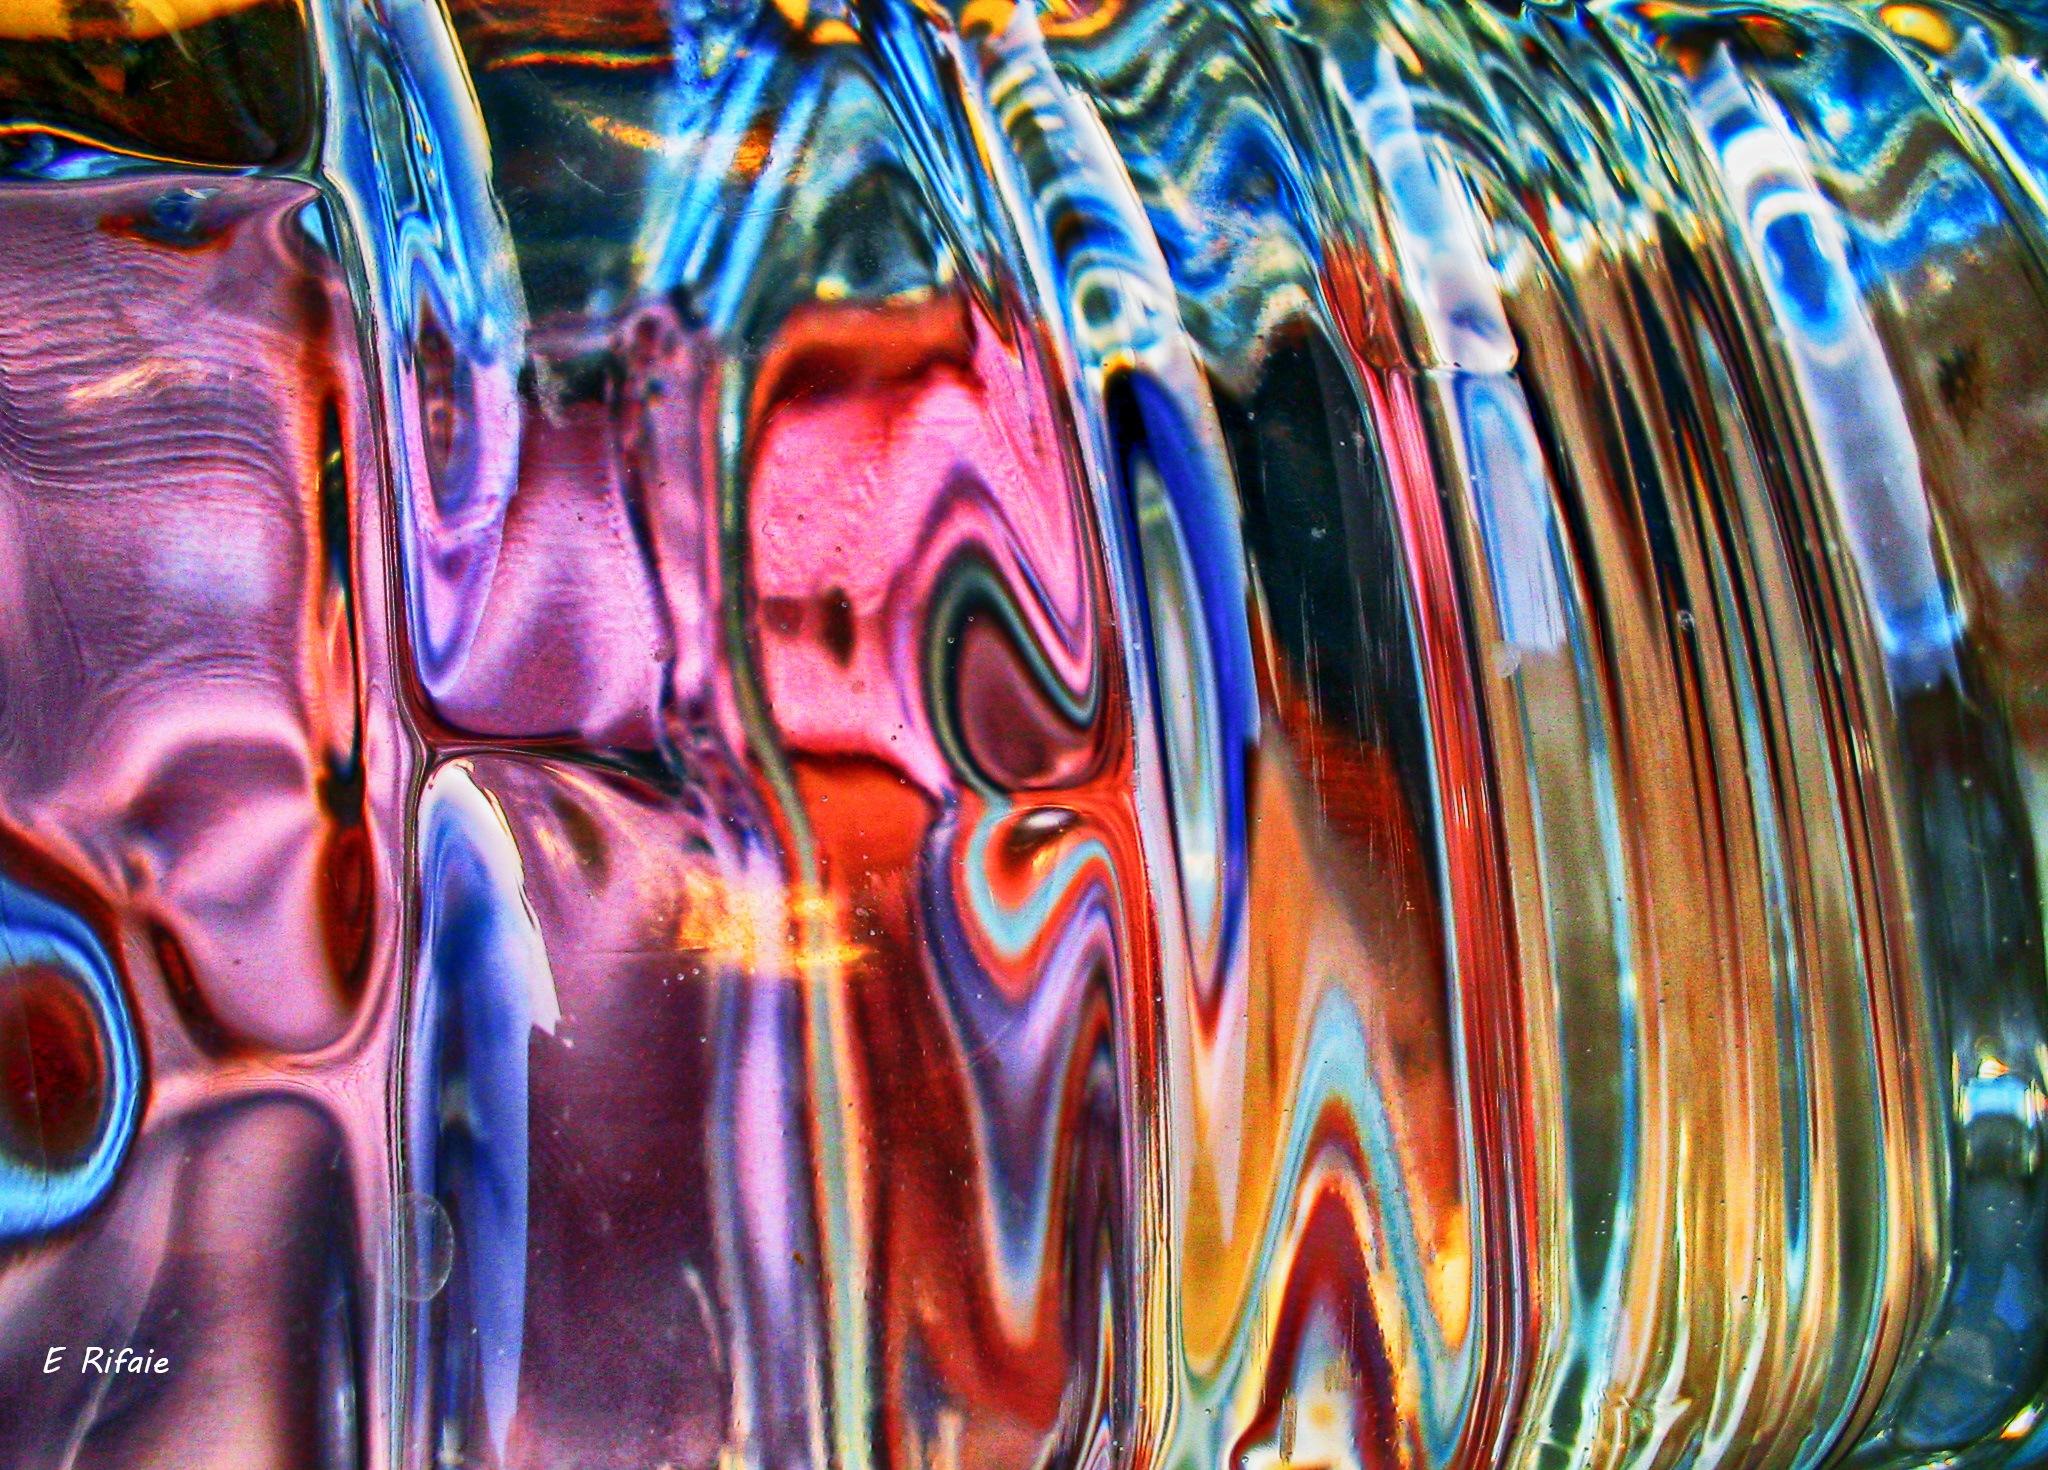 Different colors by Emad Eldin Moustafa El Refaie